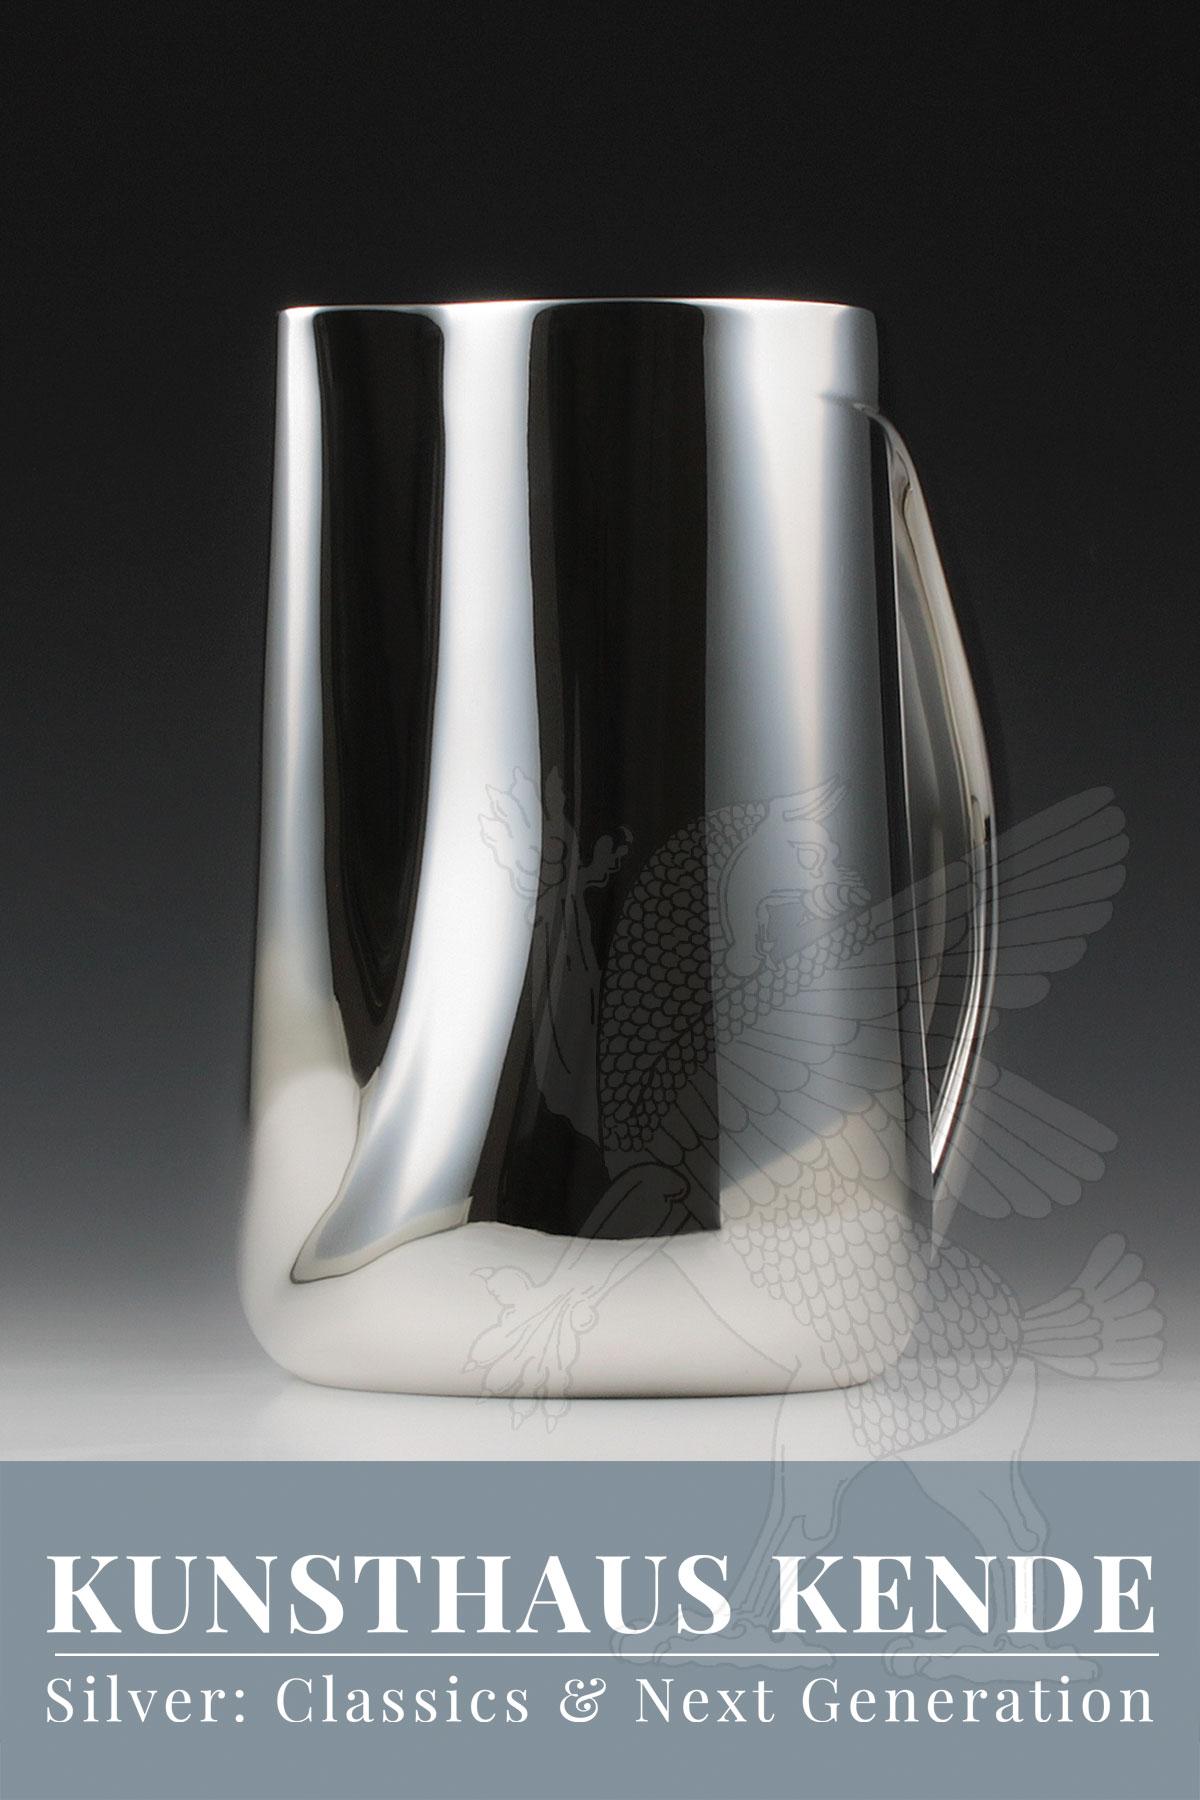 Tiffany sterling silver Elsa Peretti jug decanter pitcher modern silver design